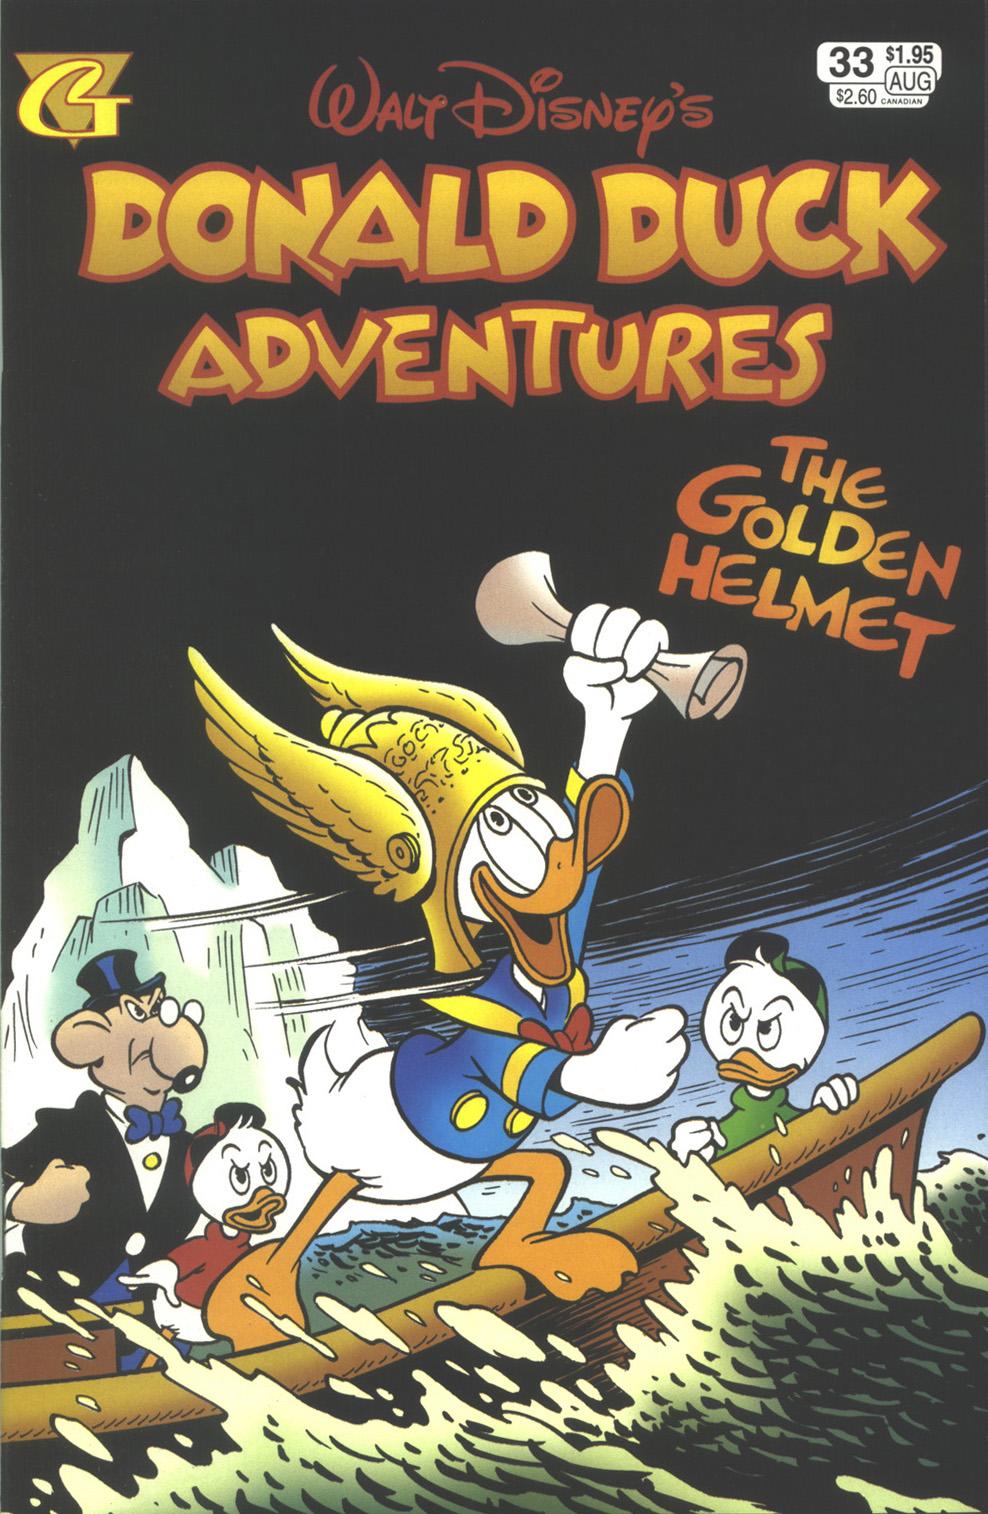 Walt Disney's Donald Duck Adventures (1987) issue 33 - Page 1